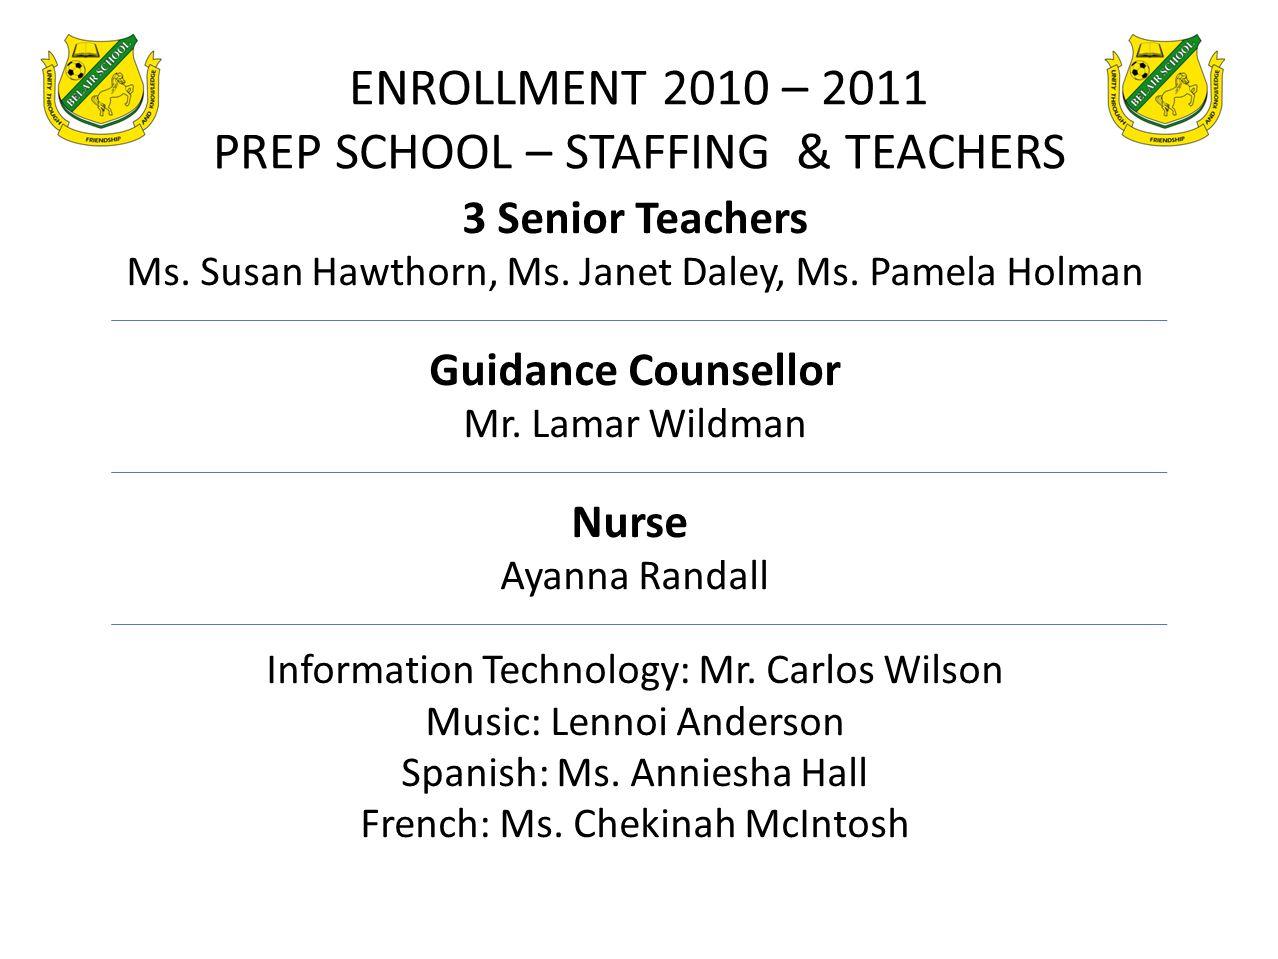 ENROLLMENT 2010 – 2011 PREP SCHOOL – STAFFING & TEACHERS